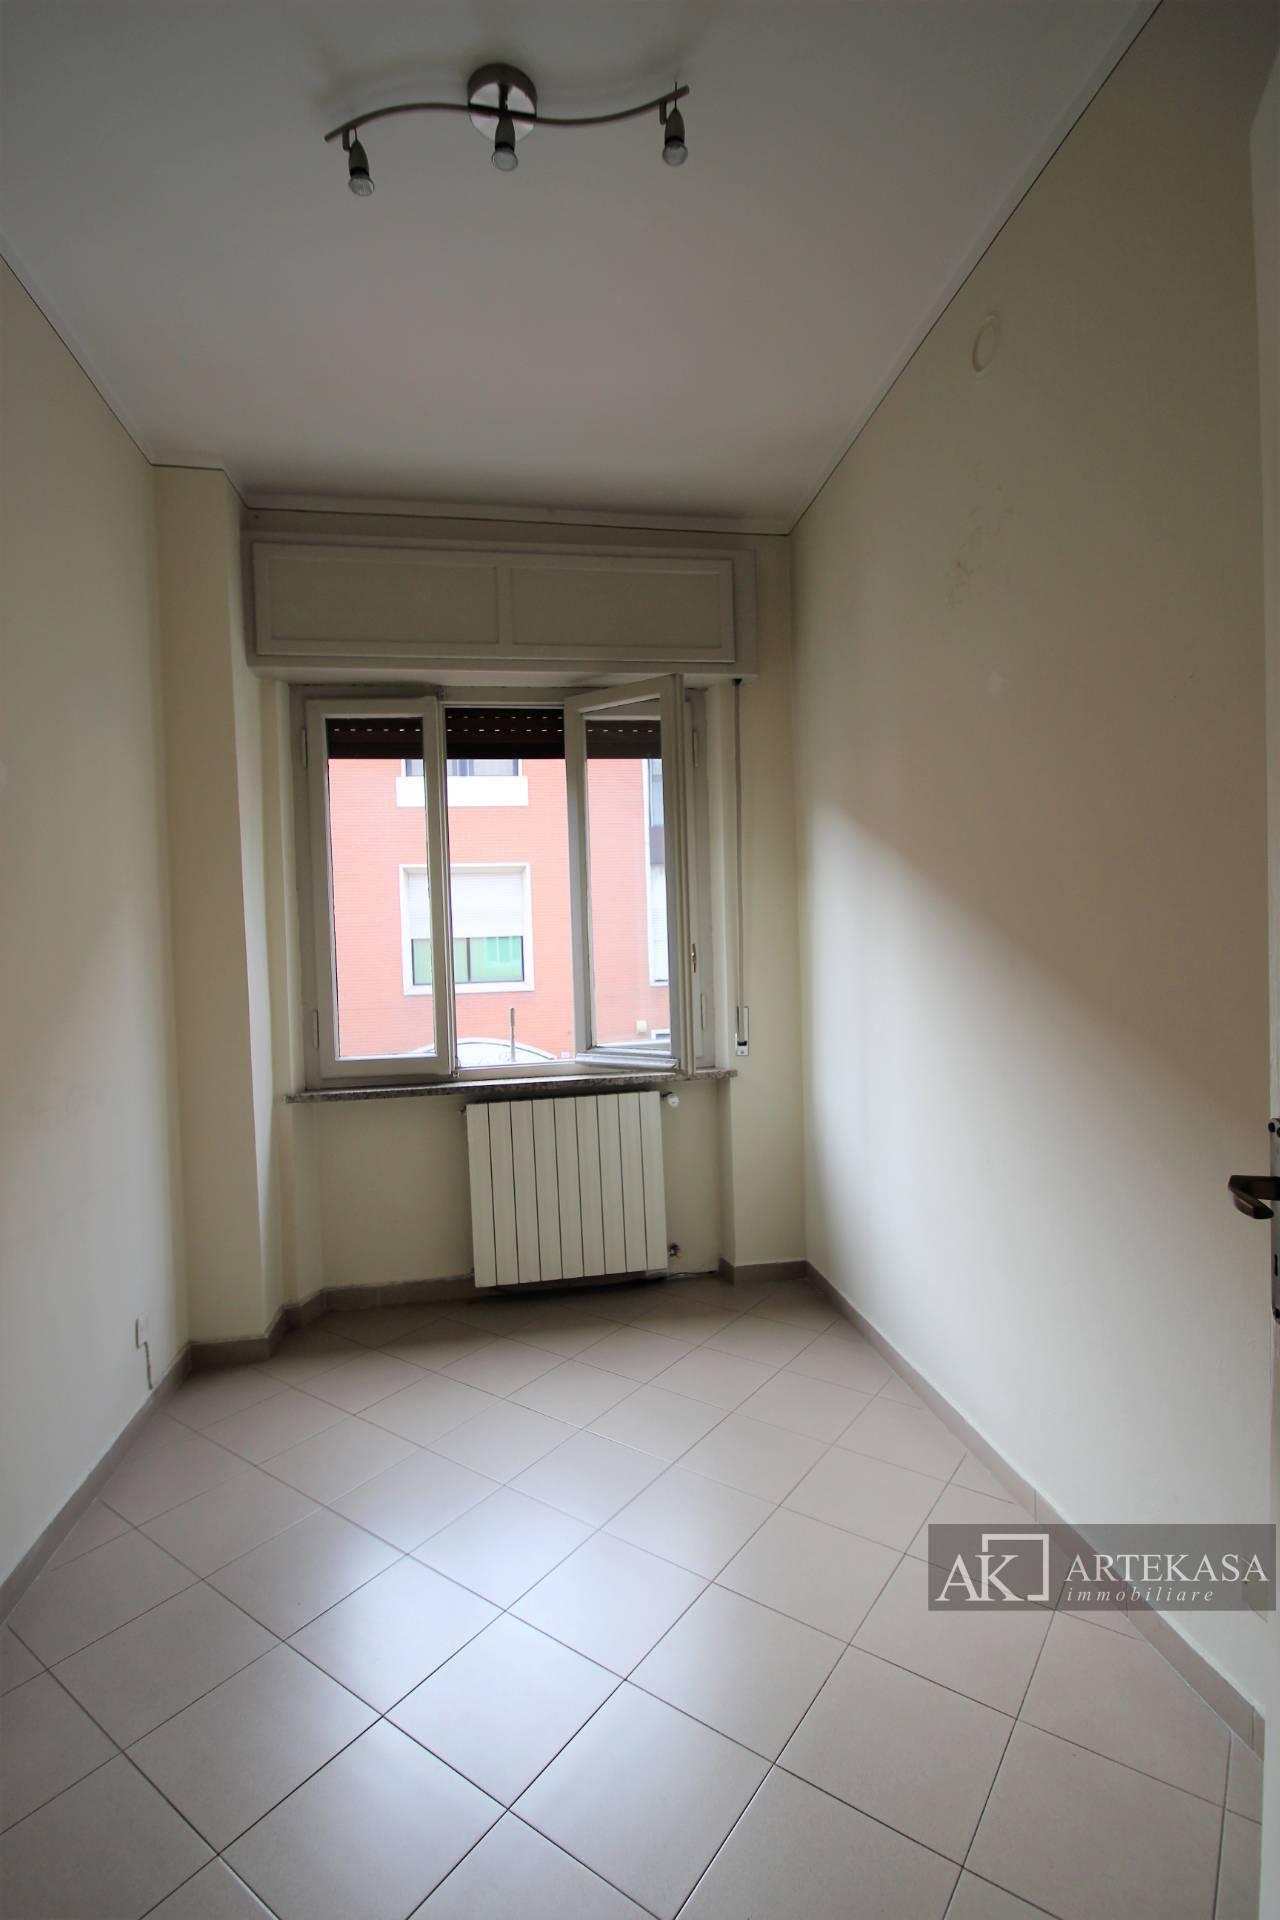 Studio/ufficio Novara - Sacro Cuore